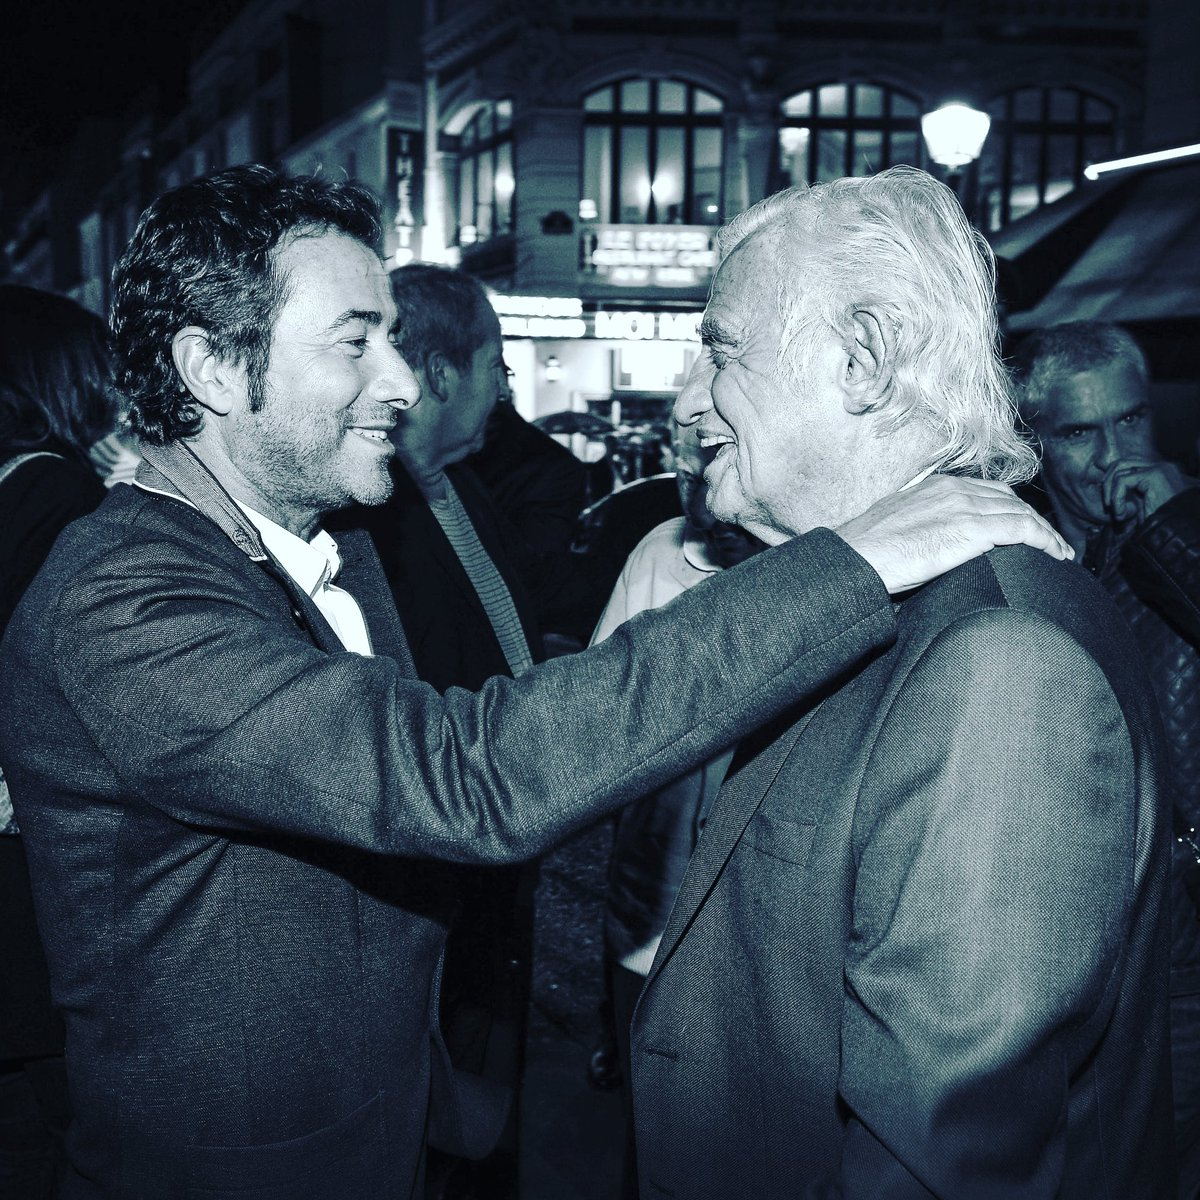 La légende #JEANPAULBELMONDO #admiration #respect #talent #gentillesse #cinema #art merci photo @charly.hel.pixhel.prod <br>http://pic.twitter.com/dK3SkgHech